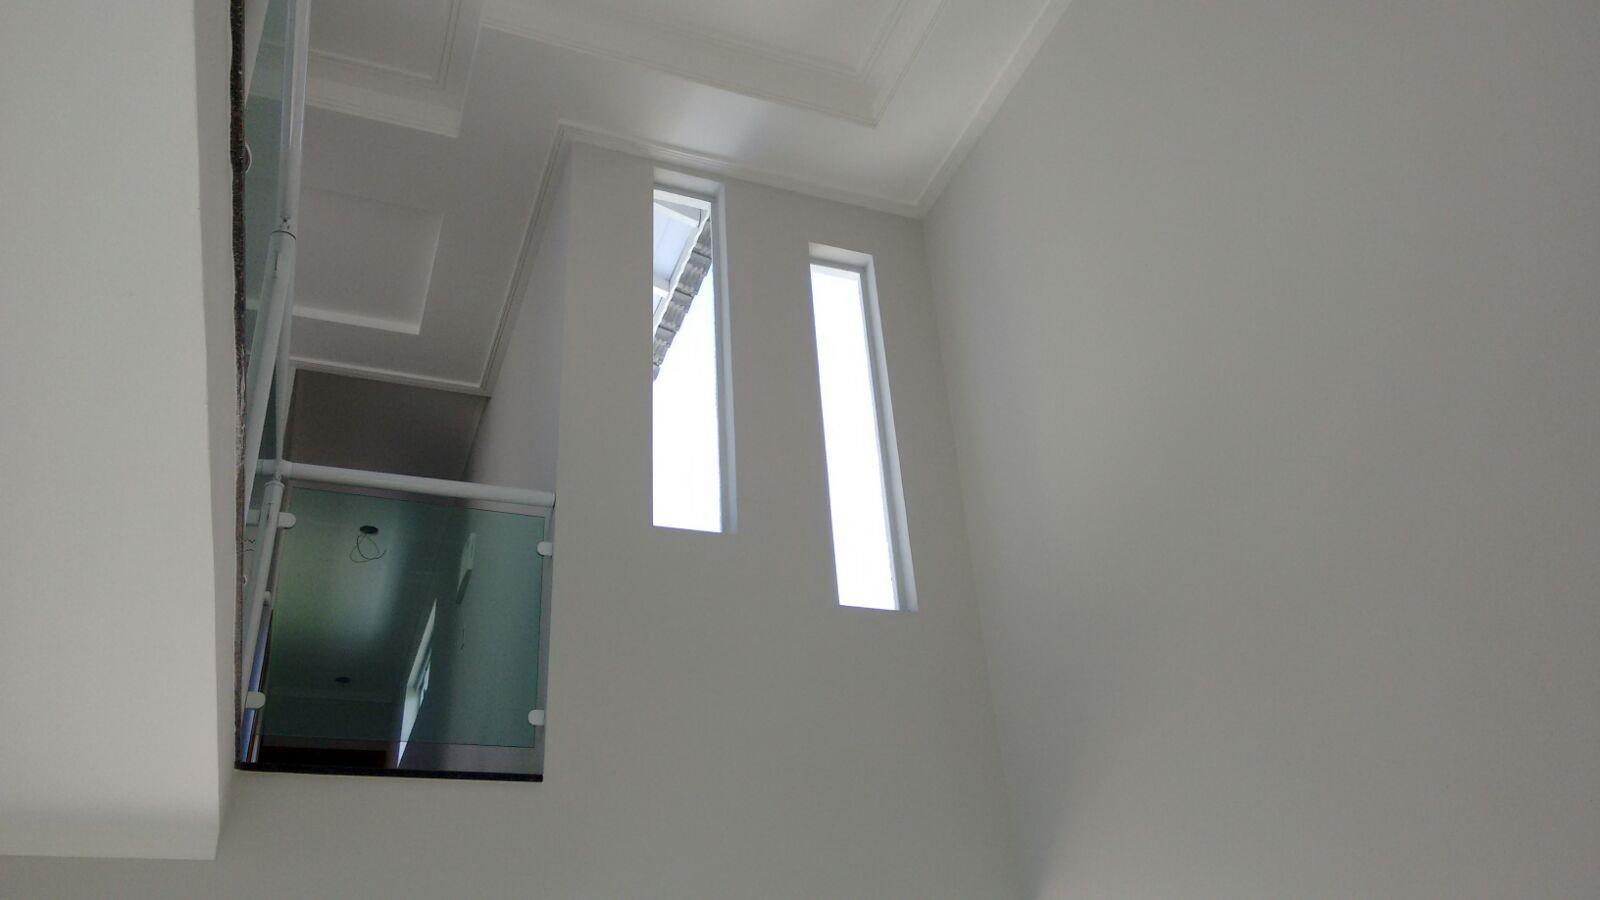 Soute Imóveis - Casa 3 Dorm, Jardim Santa Clara - Foto 2